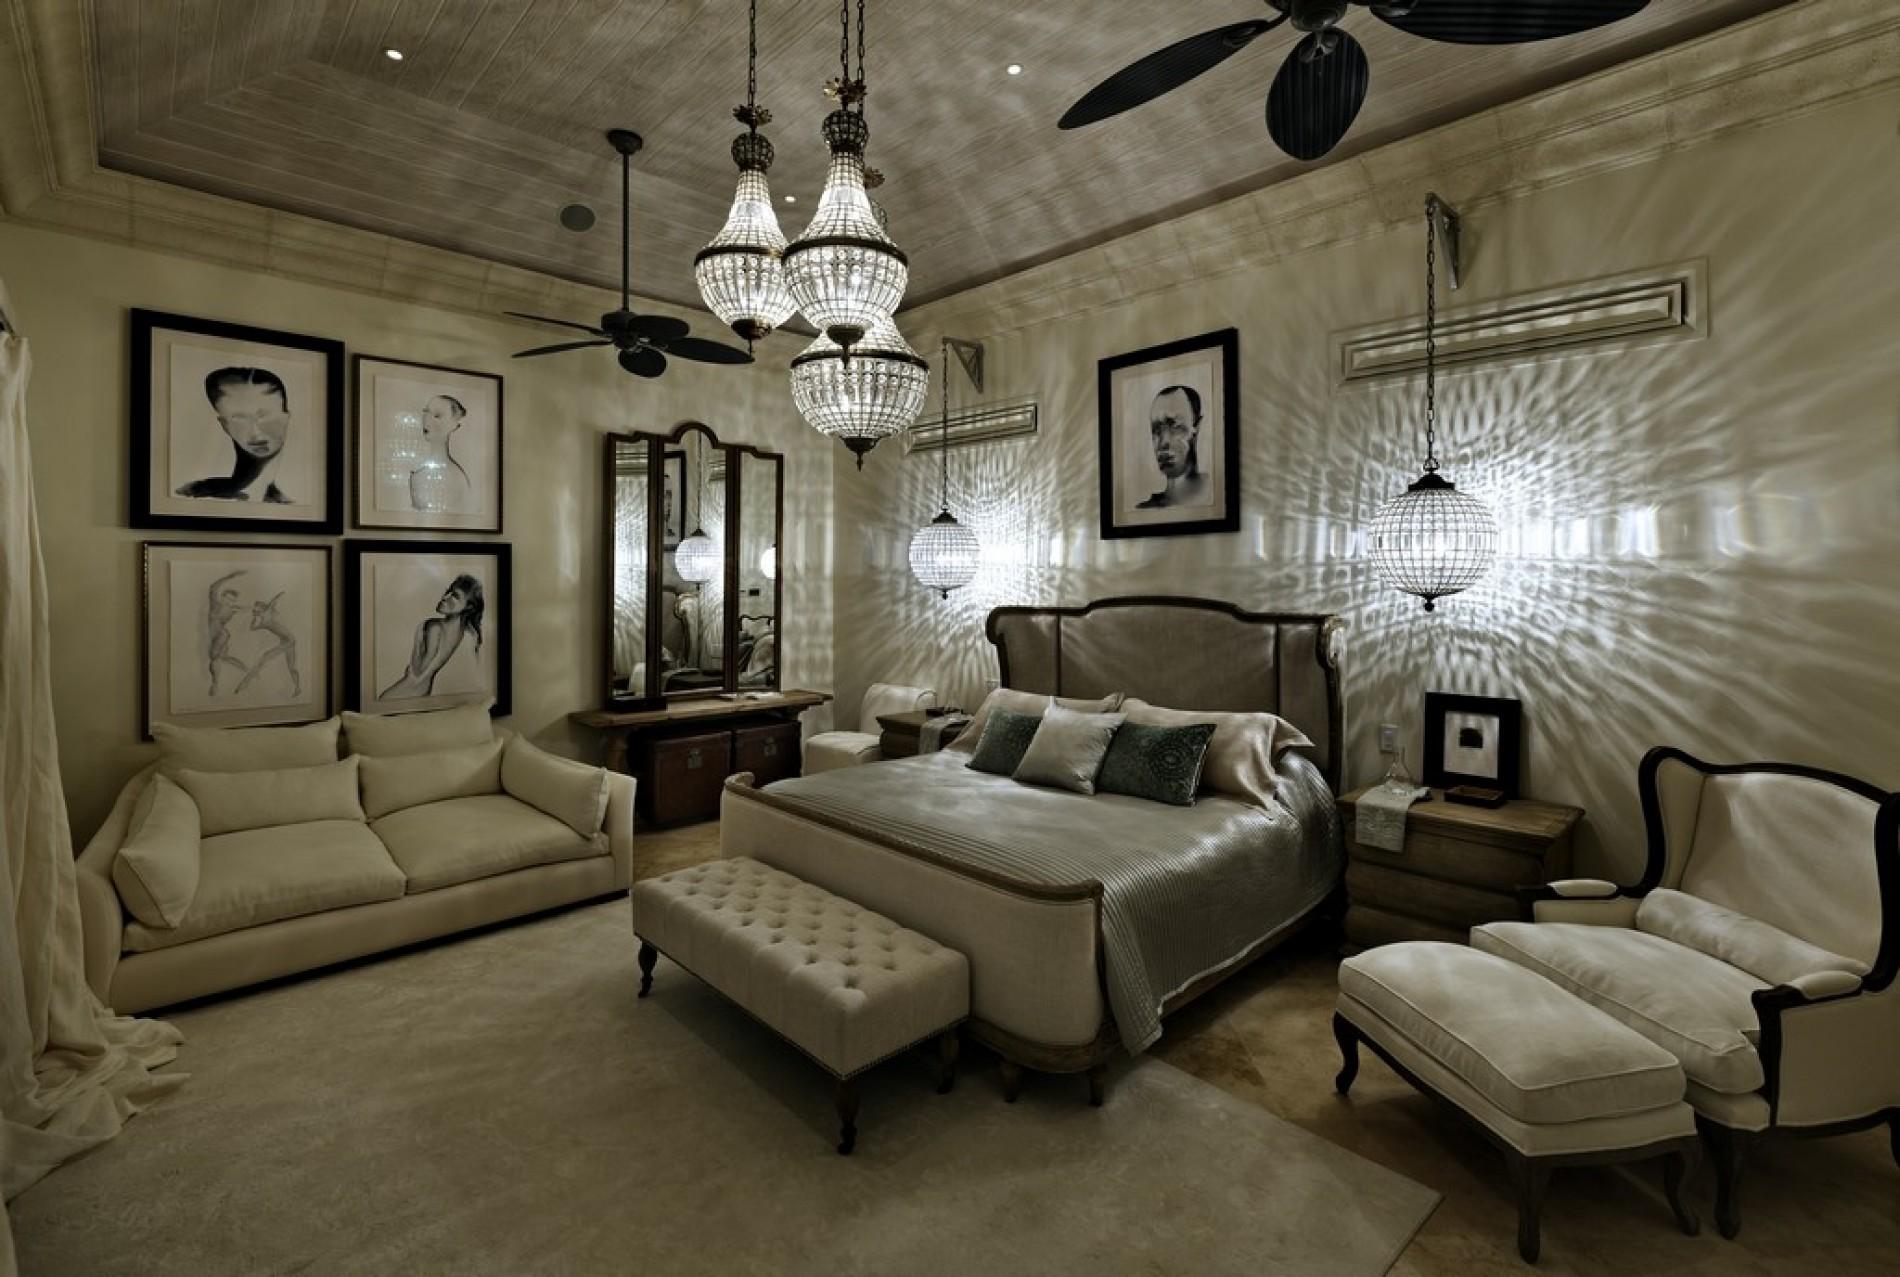 sandy cove penthouse st james barbados. Black Bedroom Furniture Sets. Home Design Ideas